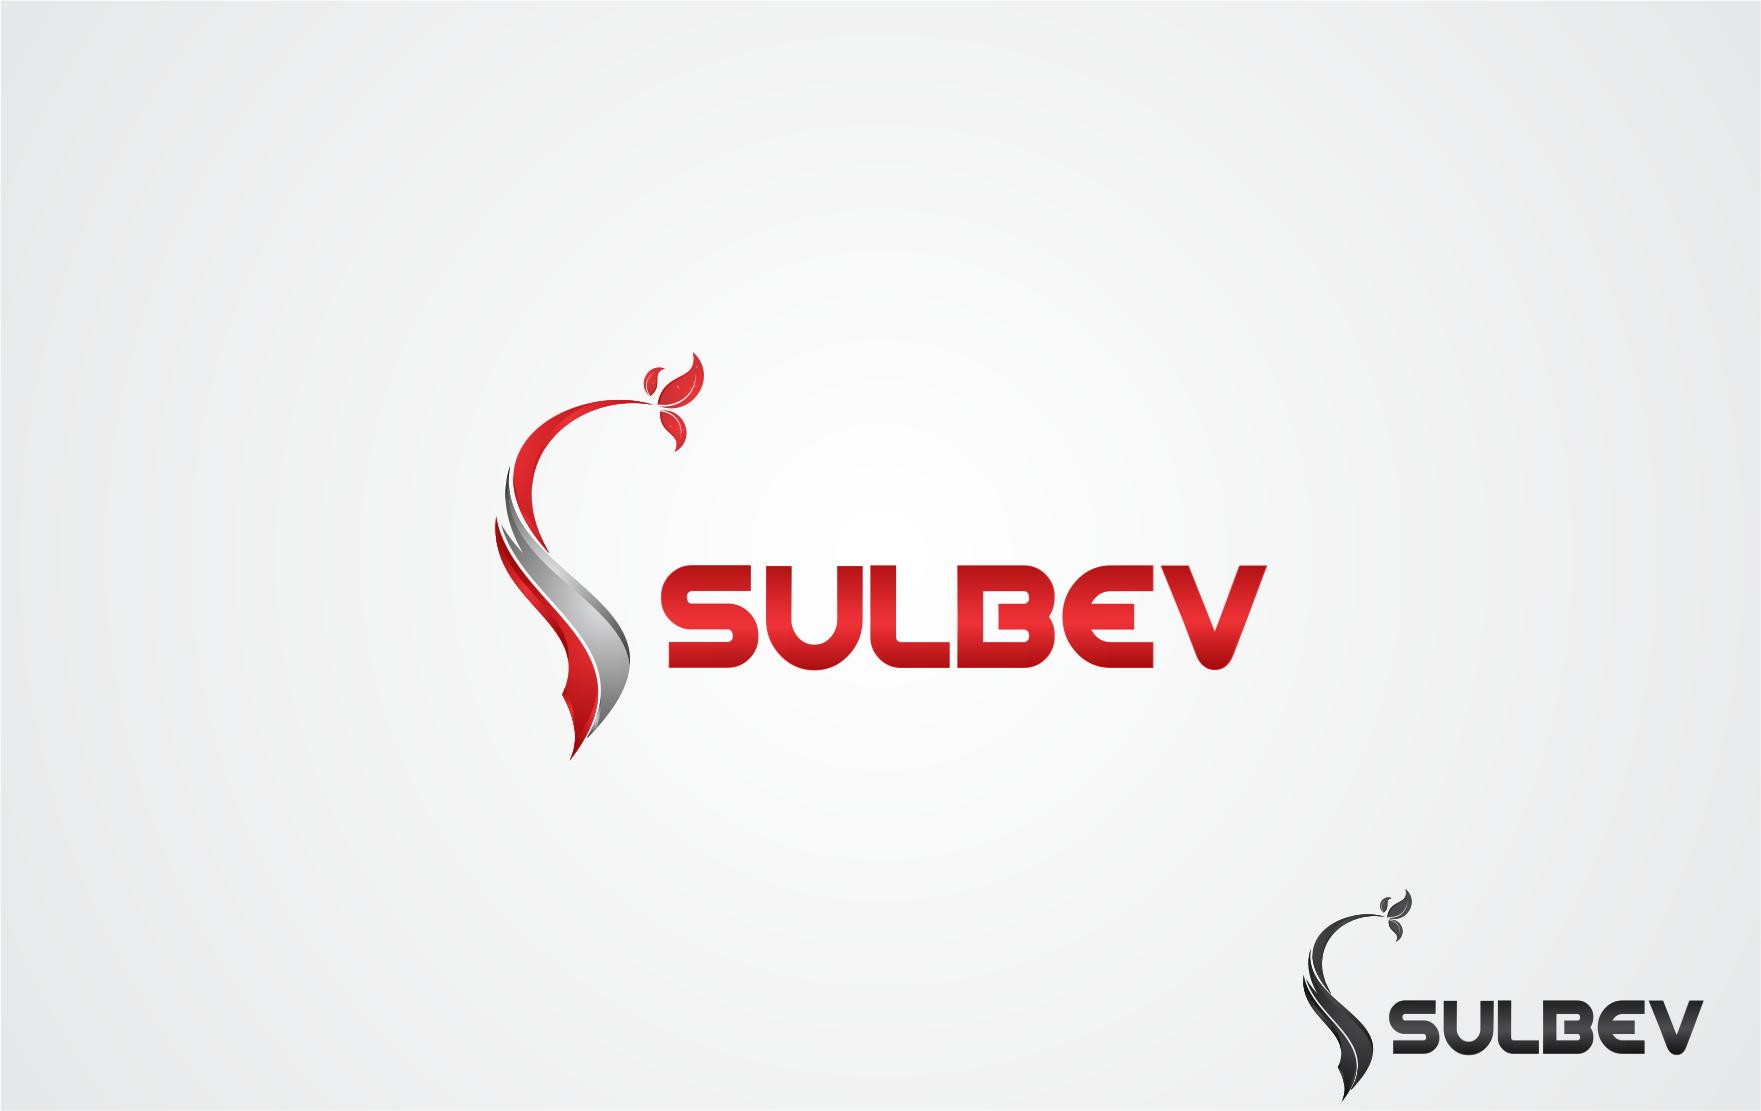 Logo Design by Dicky Kurniadi Hari Saputro - Entry No. 44 in the Logo Design Contest Creative Logo Design for SULBEV.